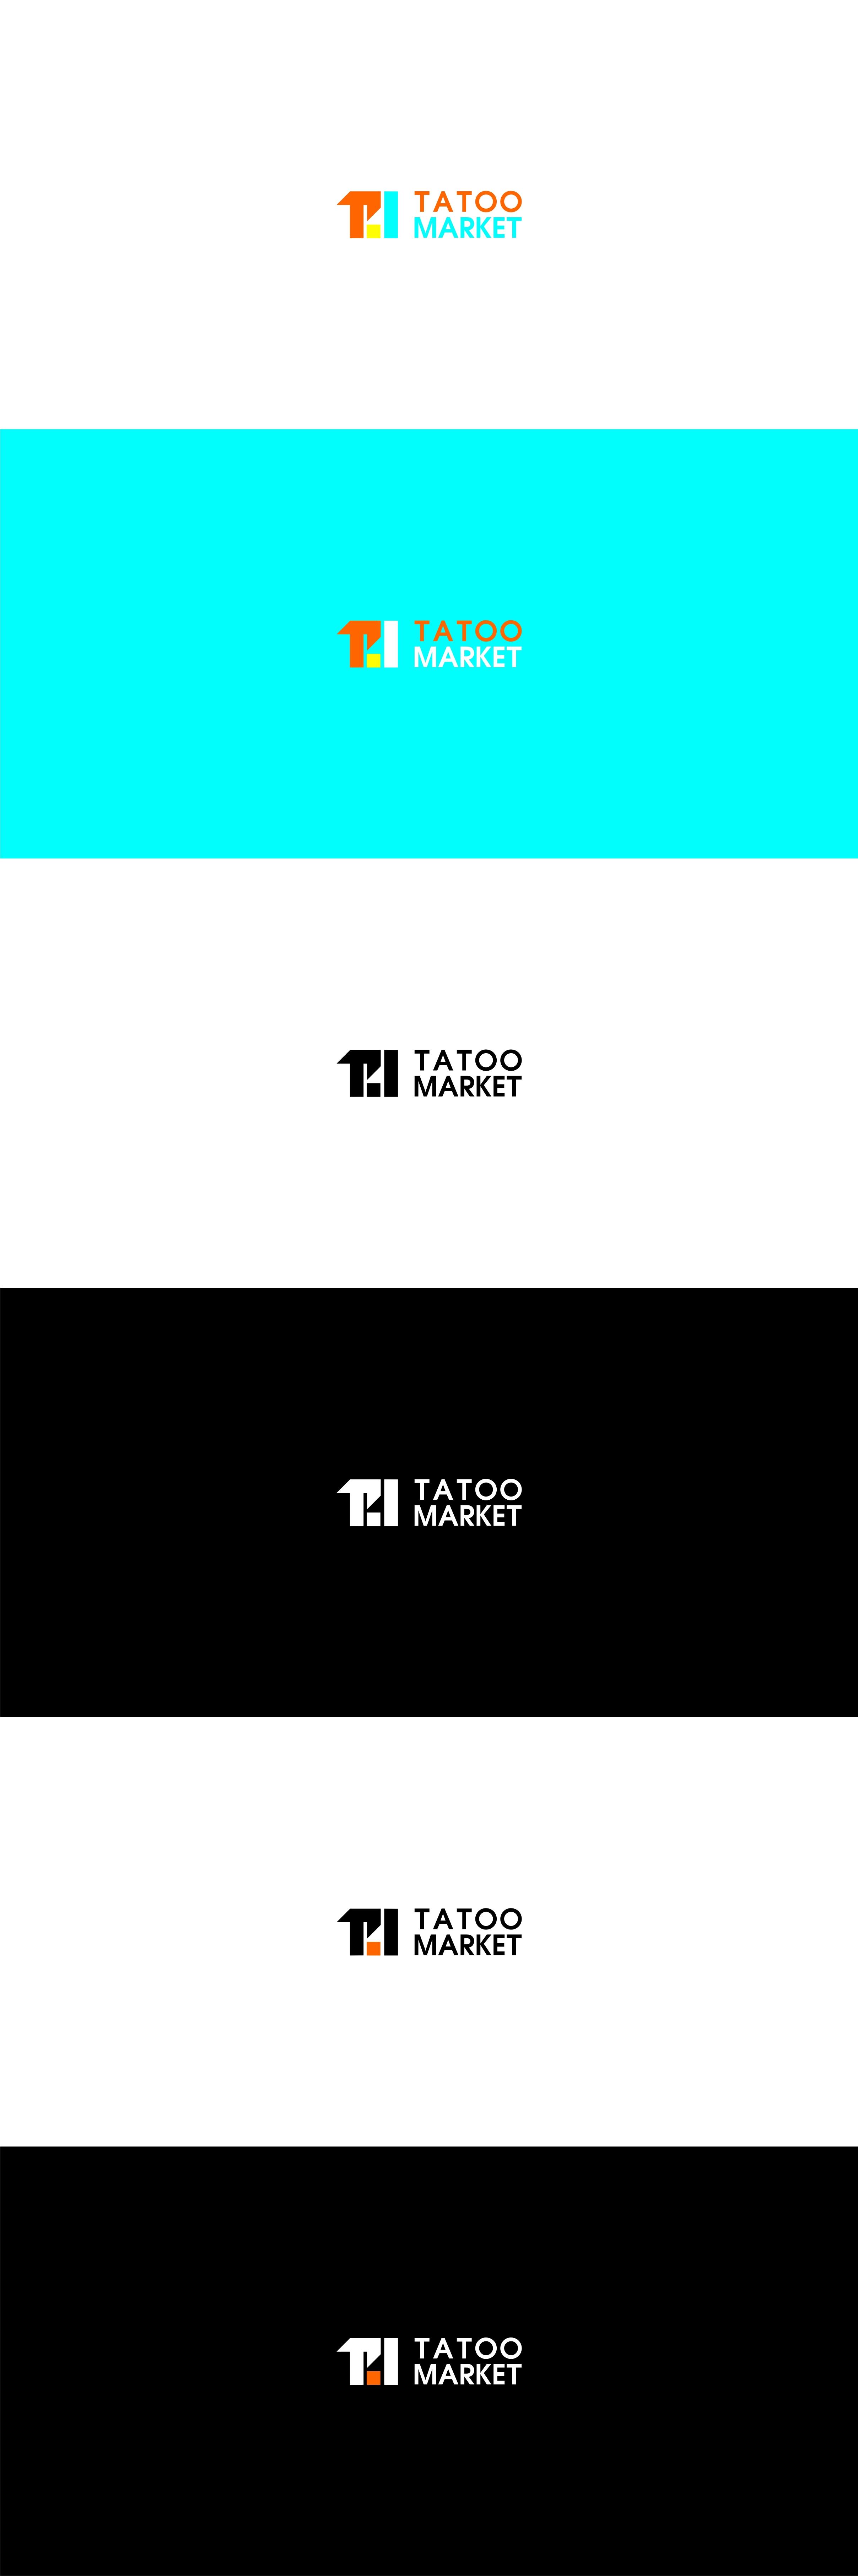 Редизайн логотипа магазина тату оборудования TattooMarket.ru фото f_4415c40752898895.jpg